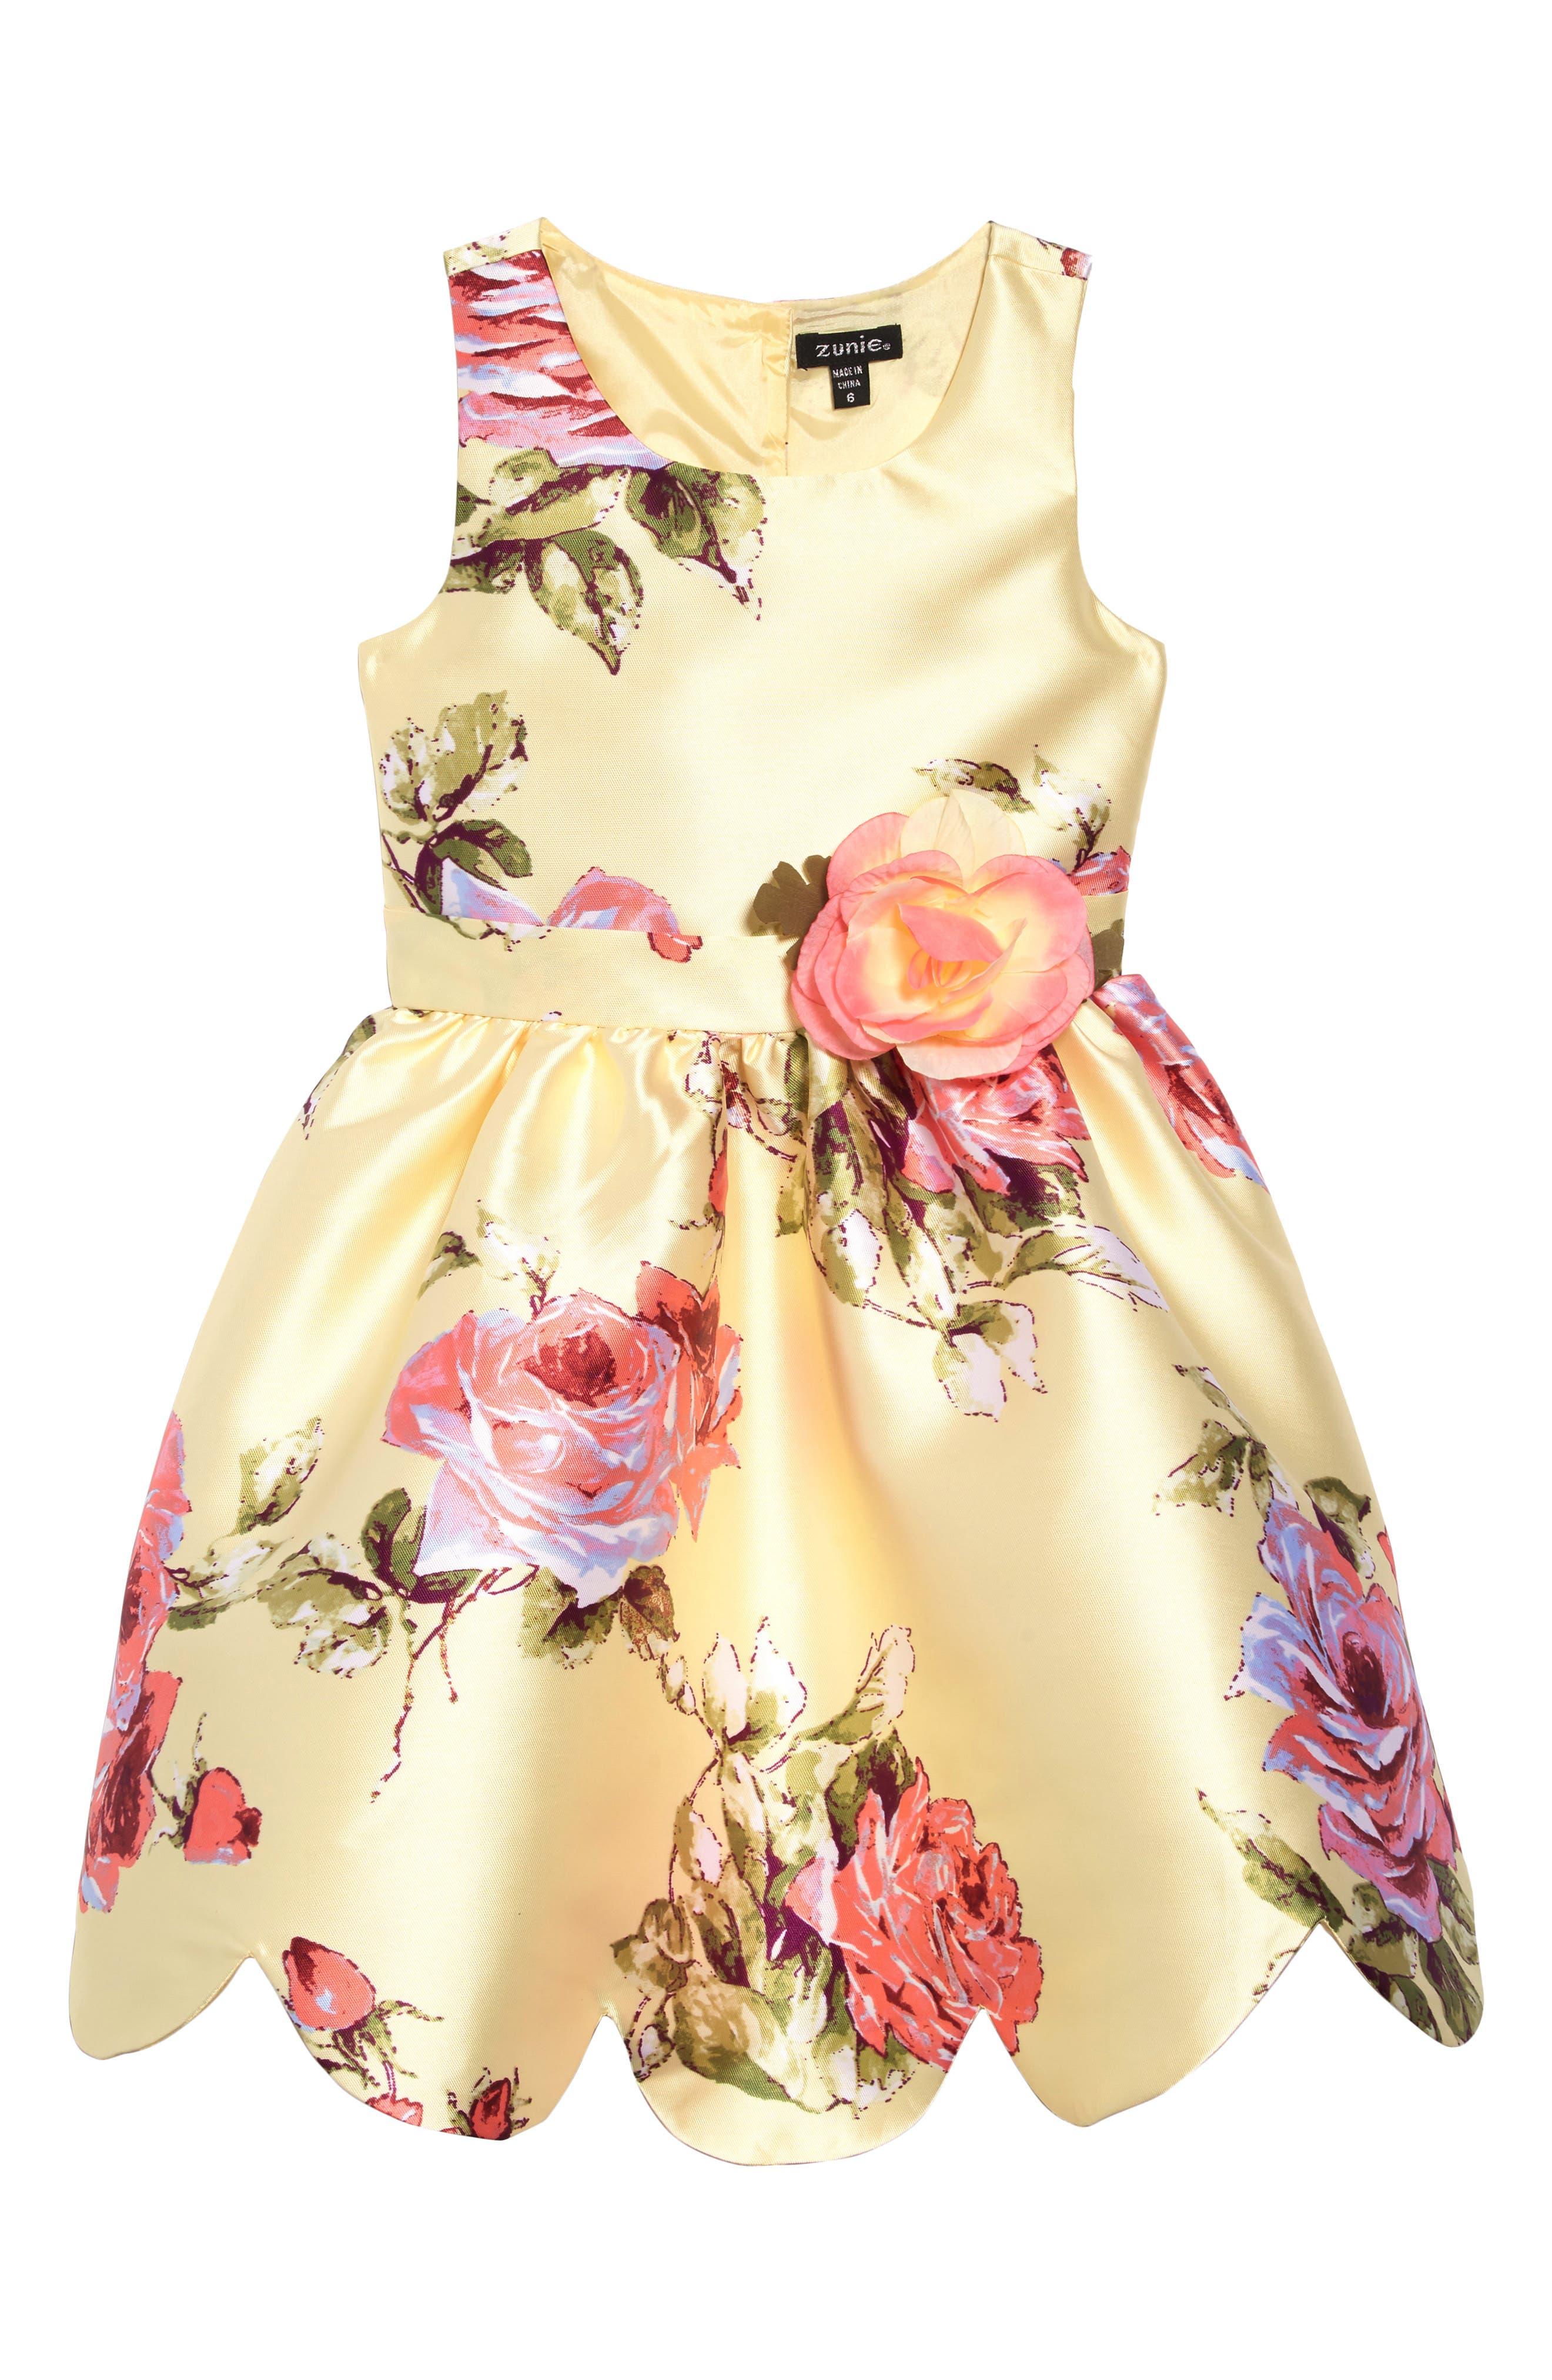 ZUNIE Floral Print Scalloped Hem Dress, Main, color, YELLOW FLORAL